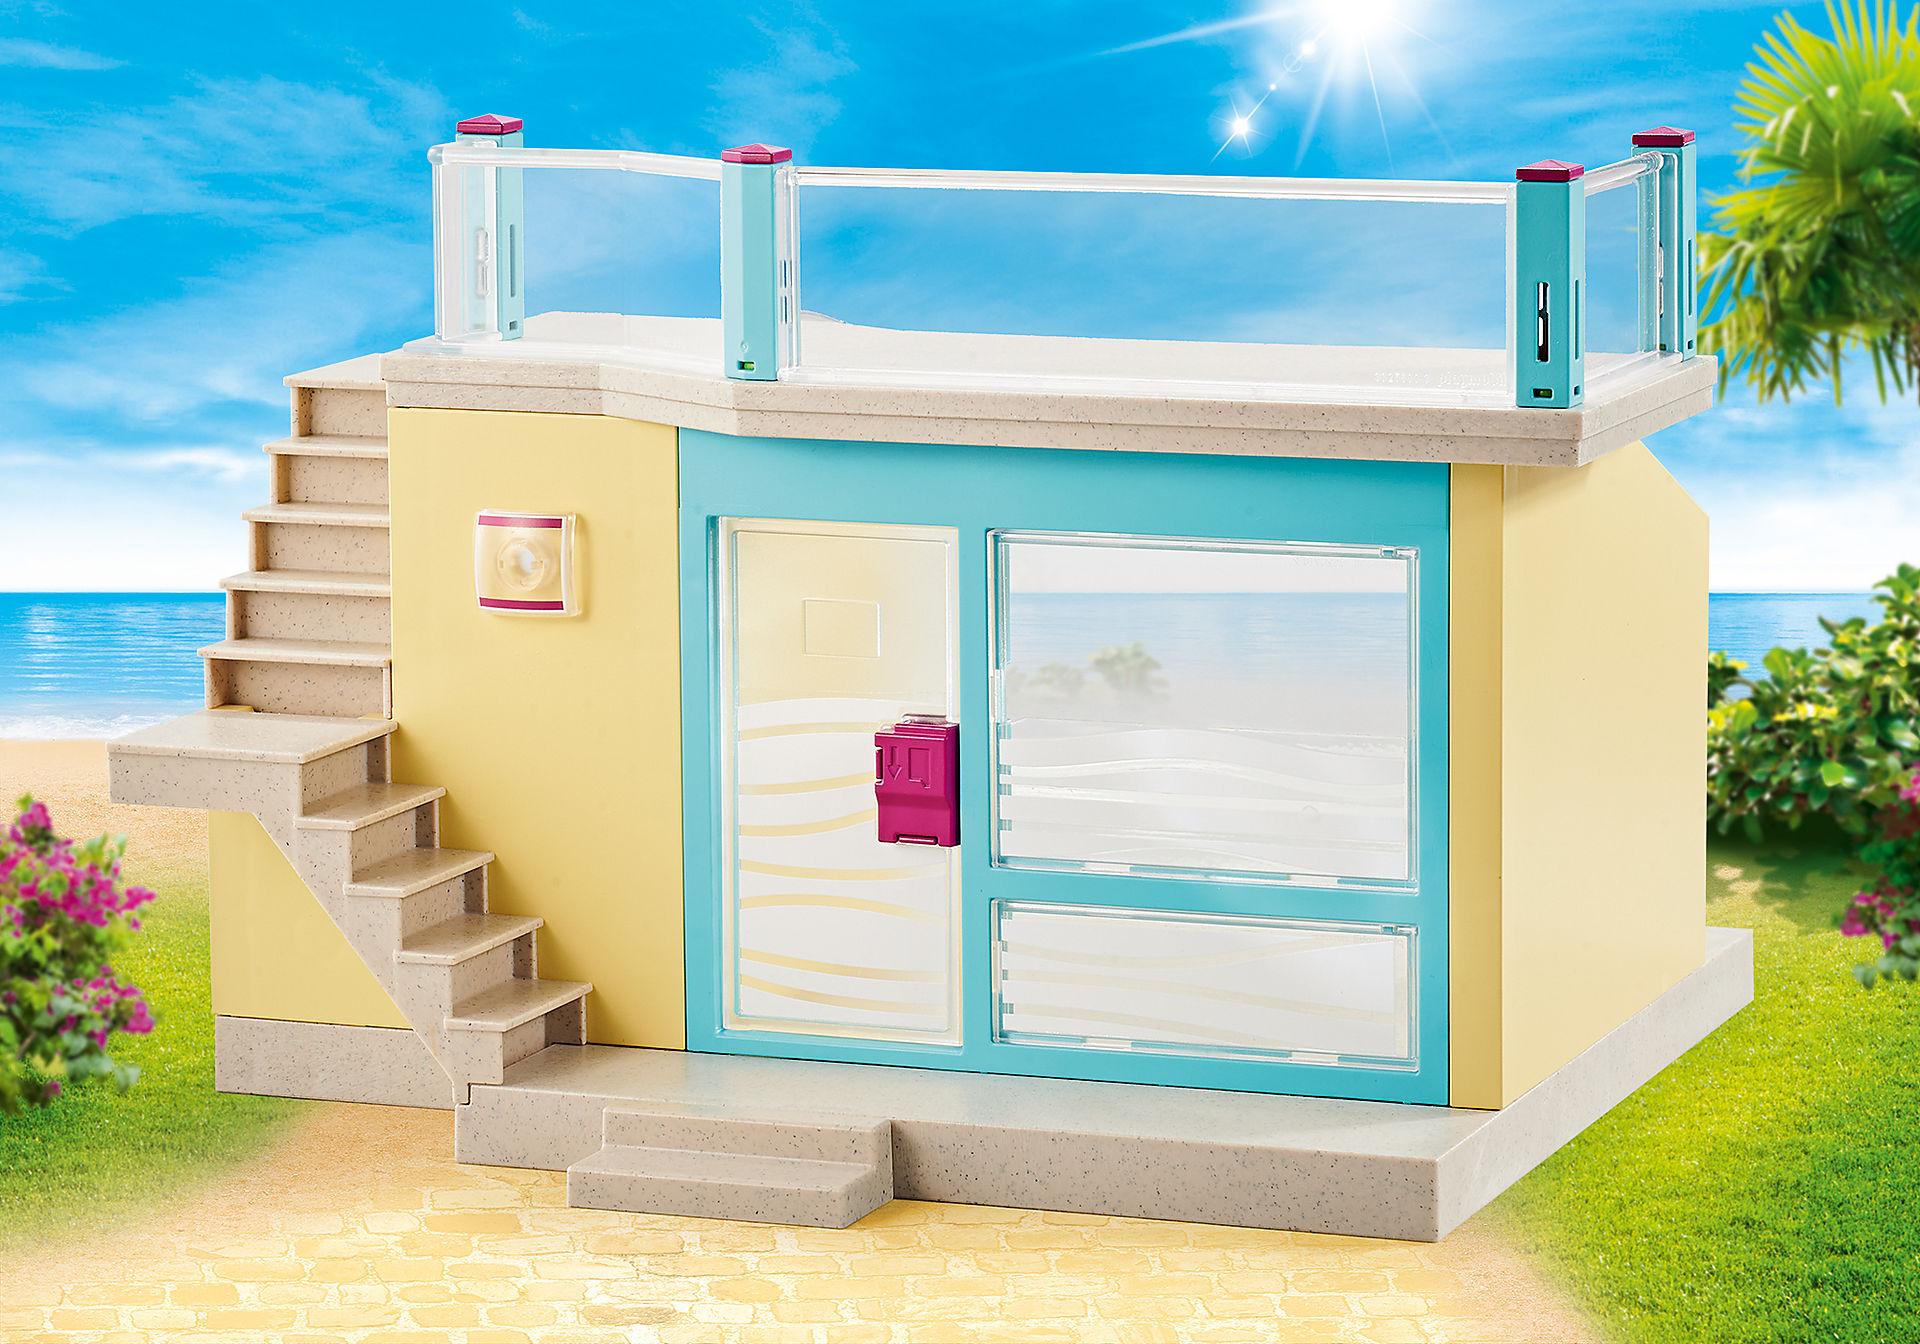 9866 Lege bungalow zoom image1